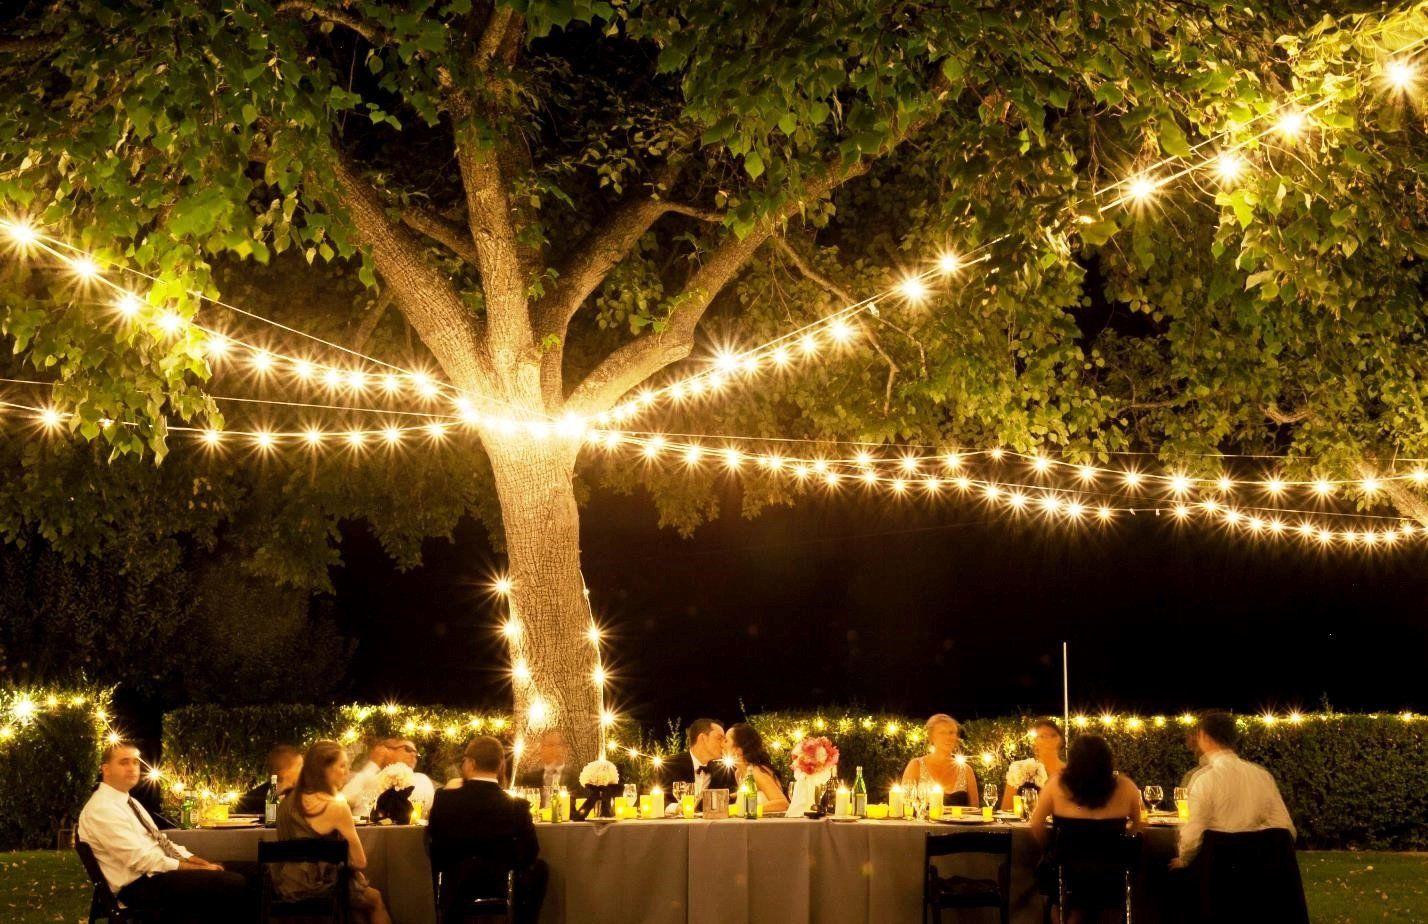 Tree Decoration For Weddings Luxury Cheap Wedding Lighting Ideas Tree Wedding Party In 2020 Outdoor Wedding Lighting Night Wedding Reception Wedding Reception Lighting